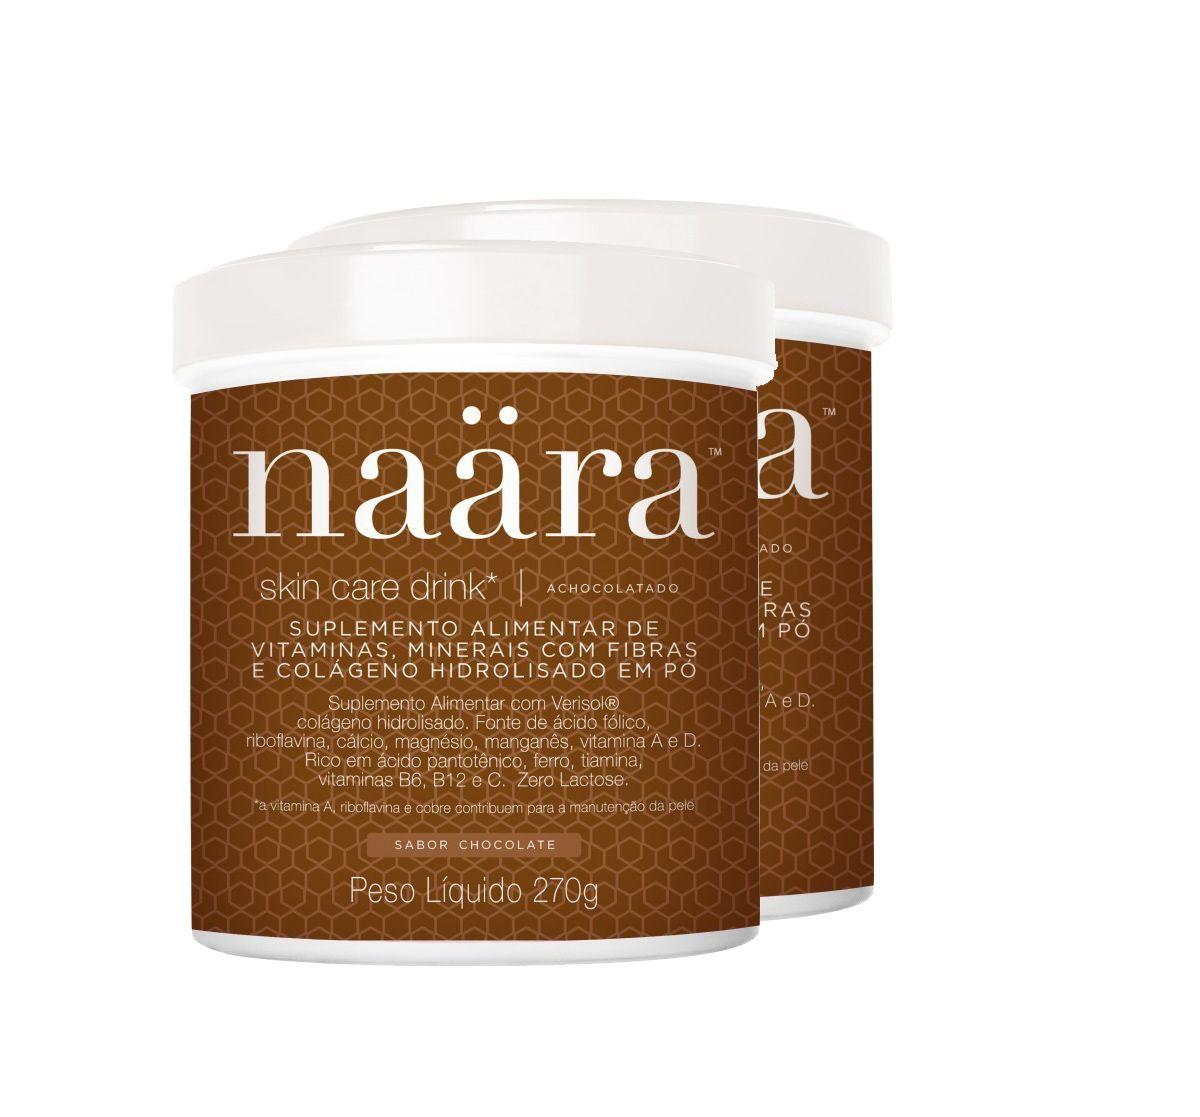 Kit 2 Suplemento Vitamínico Naära Skin Care Drink  VERISOL Chocolate 270g